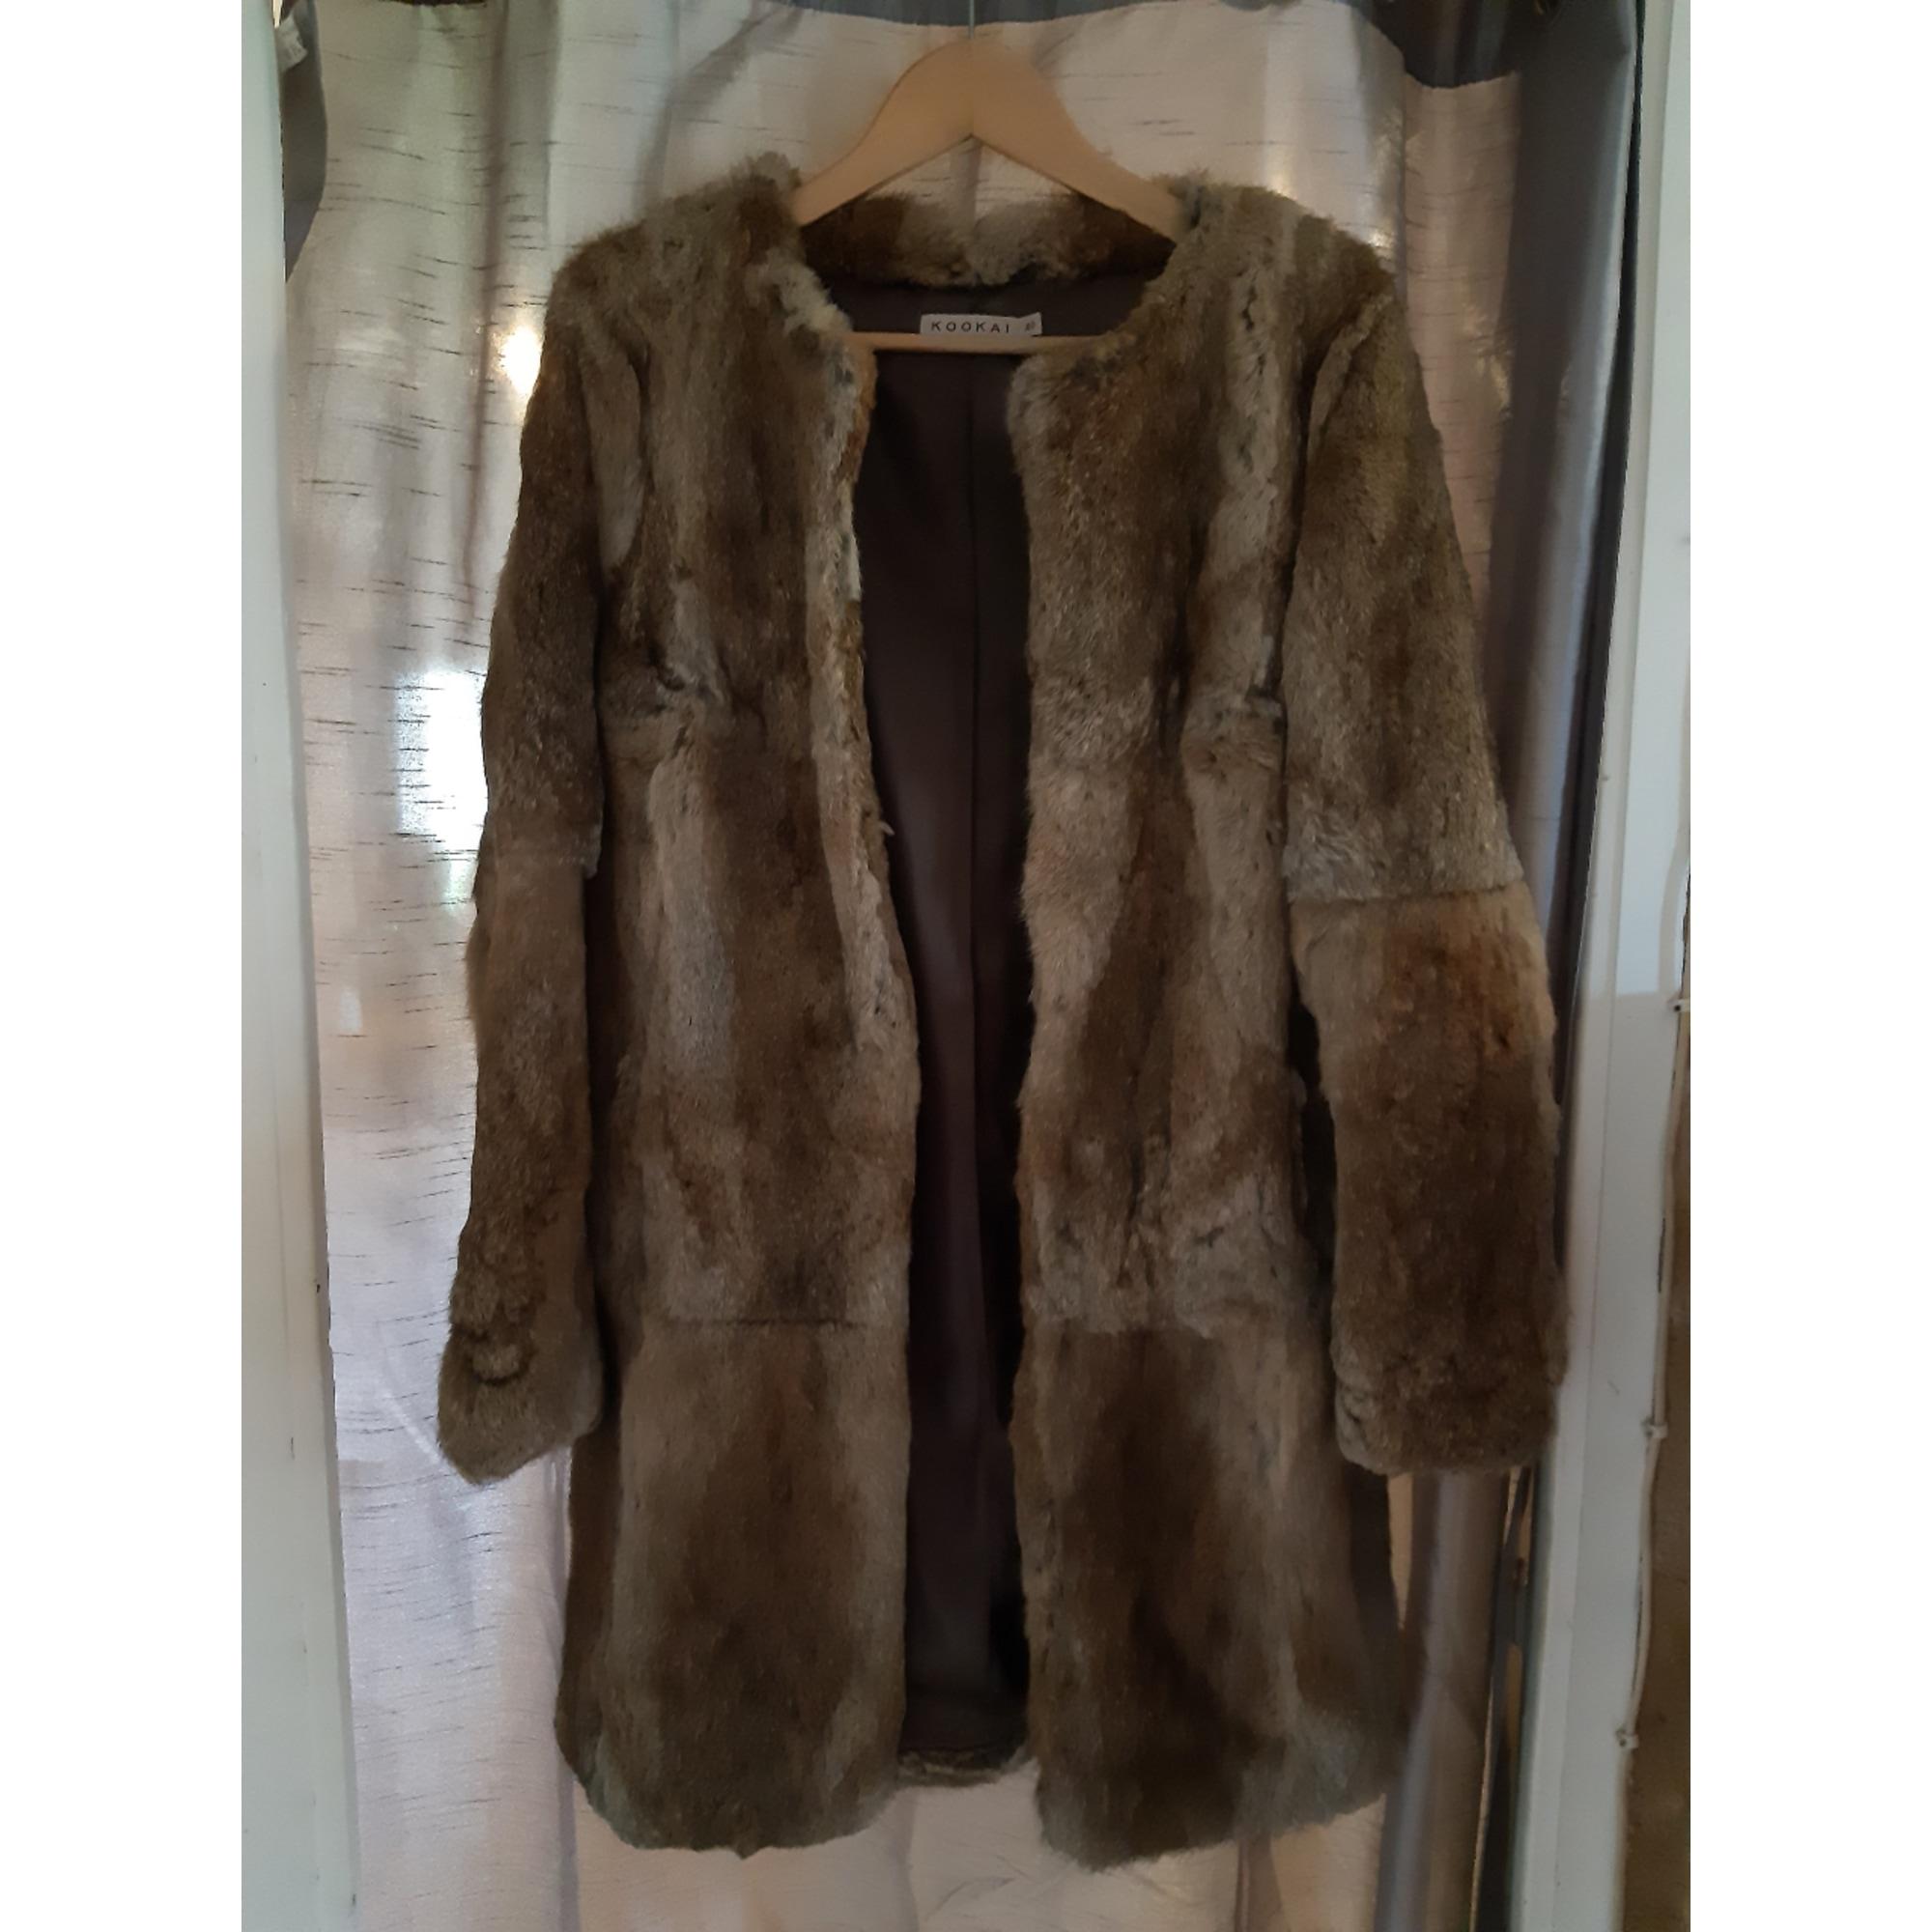 Manteau en fourrure KOOKAI Doré, bronze, cuivre